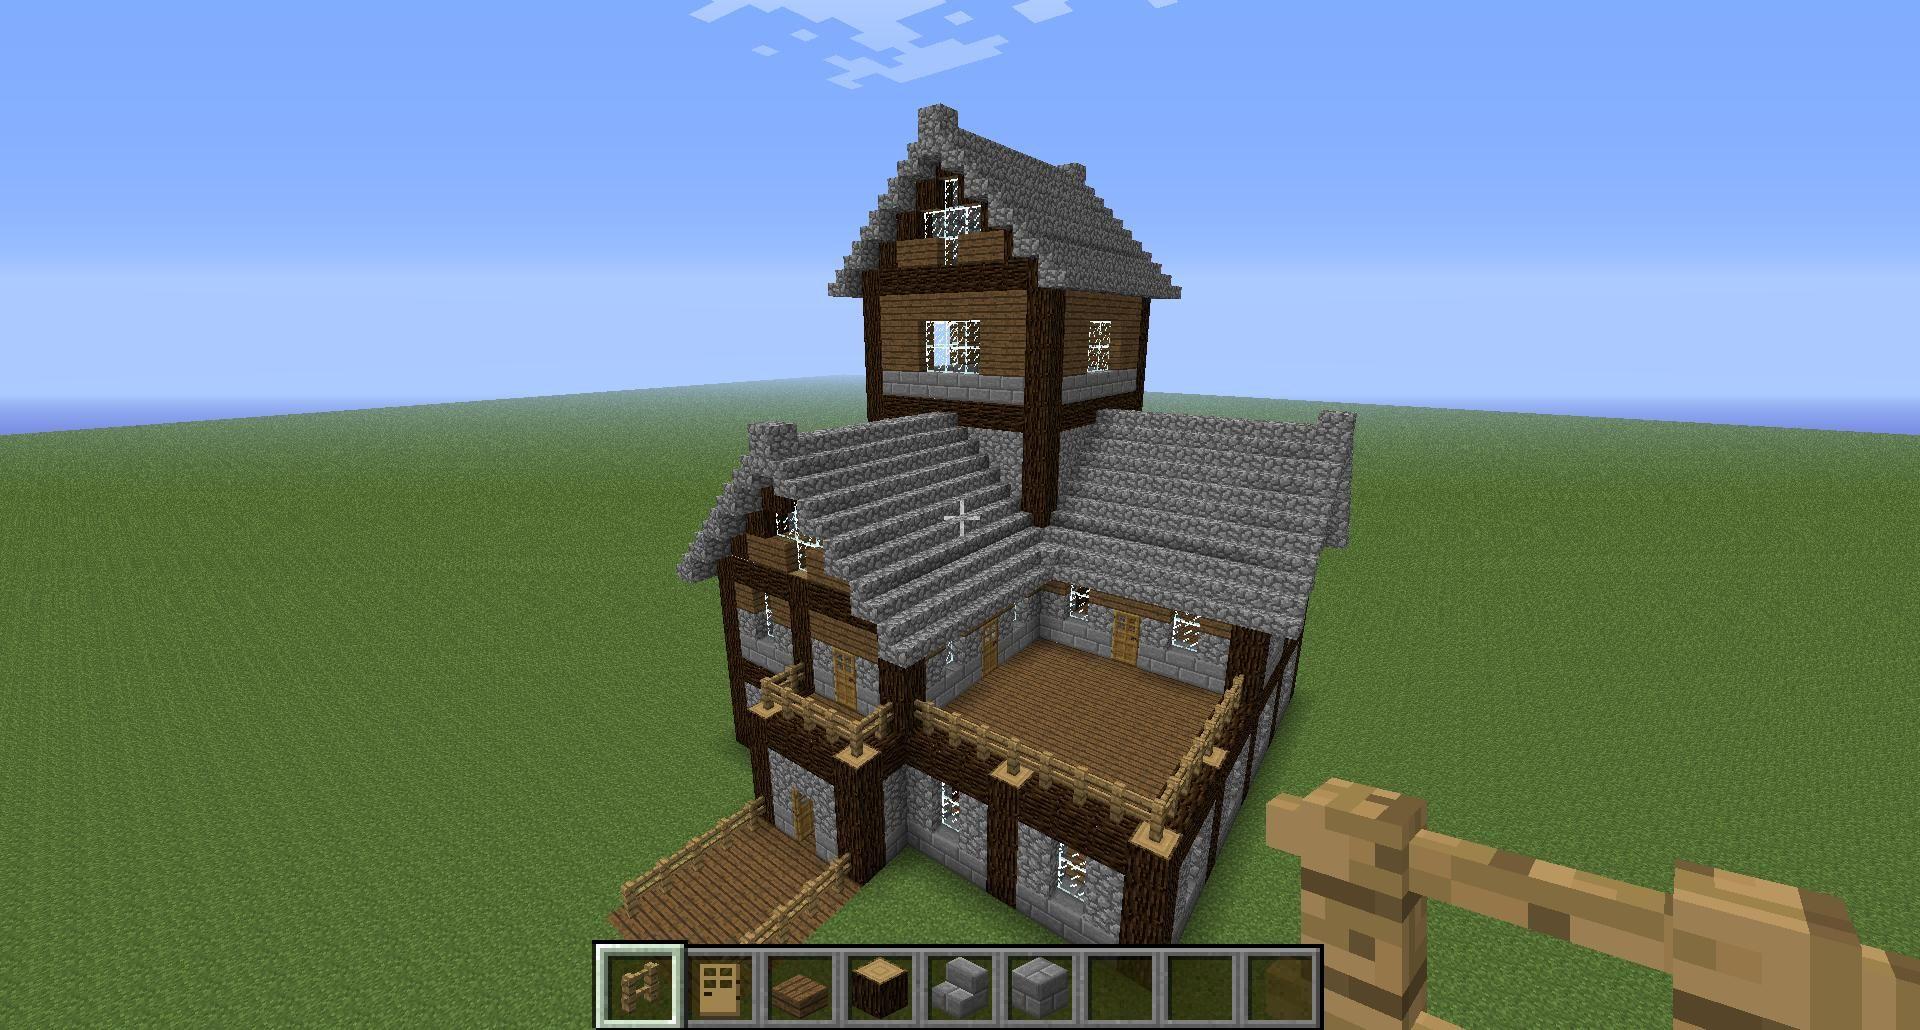 minecraft house tutorial - HD1920×1030